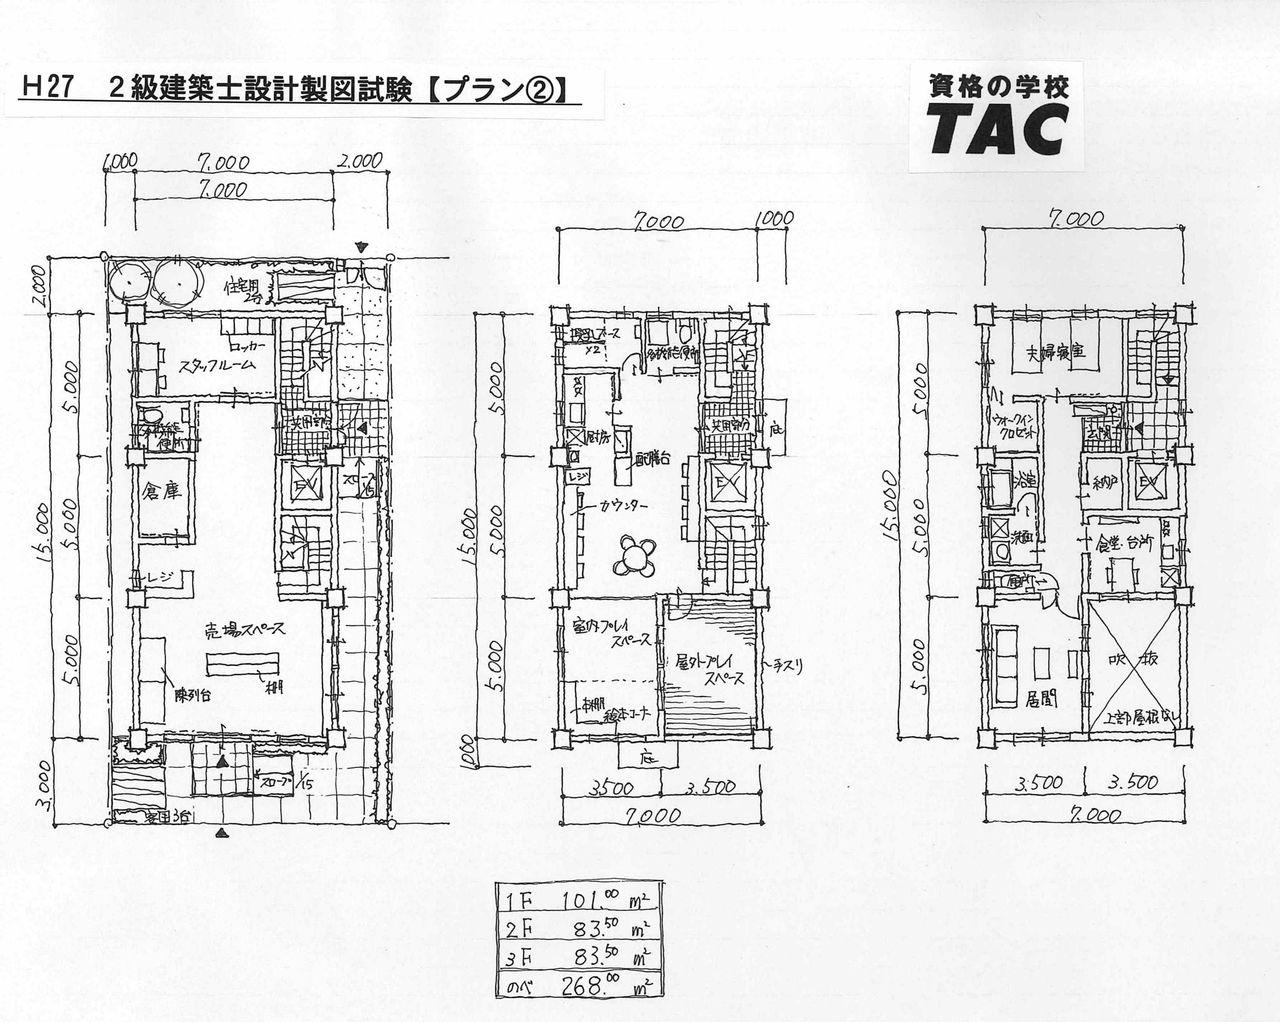 H27_2級設計製図本試験_エスキスプラン2